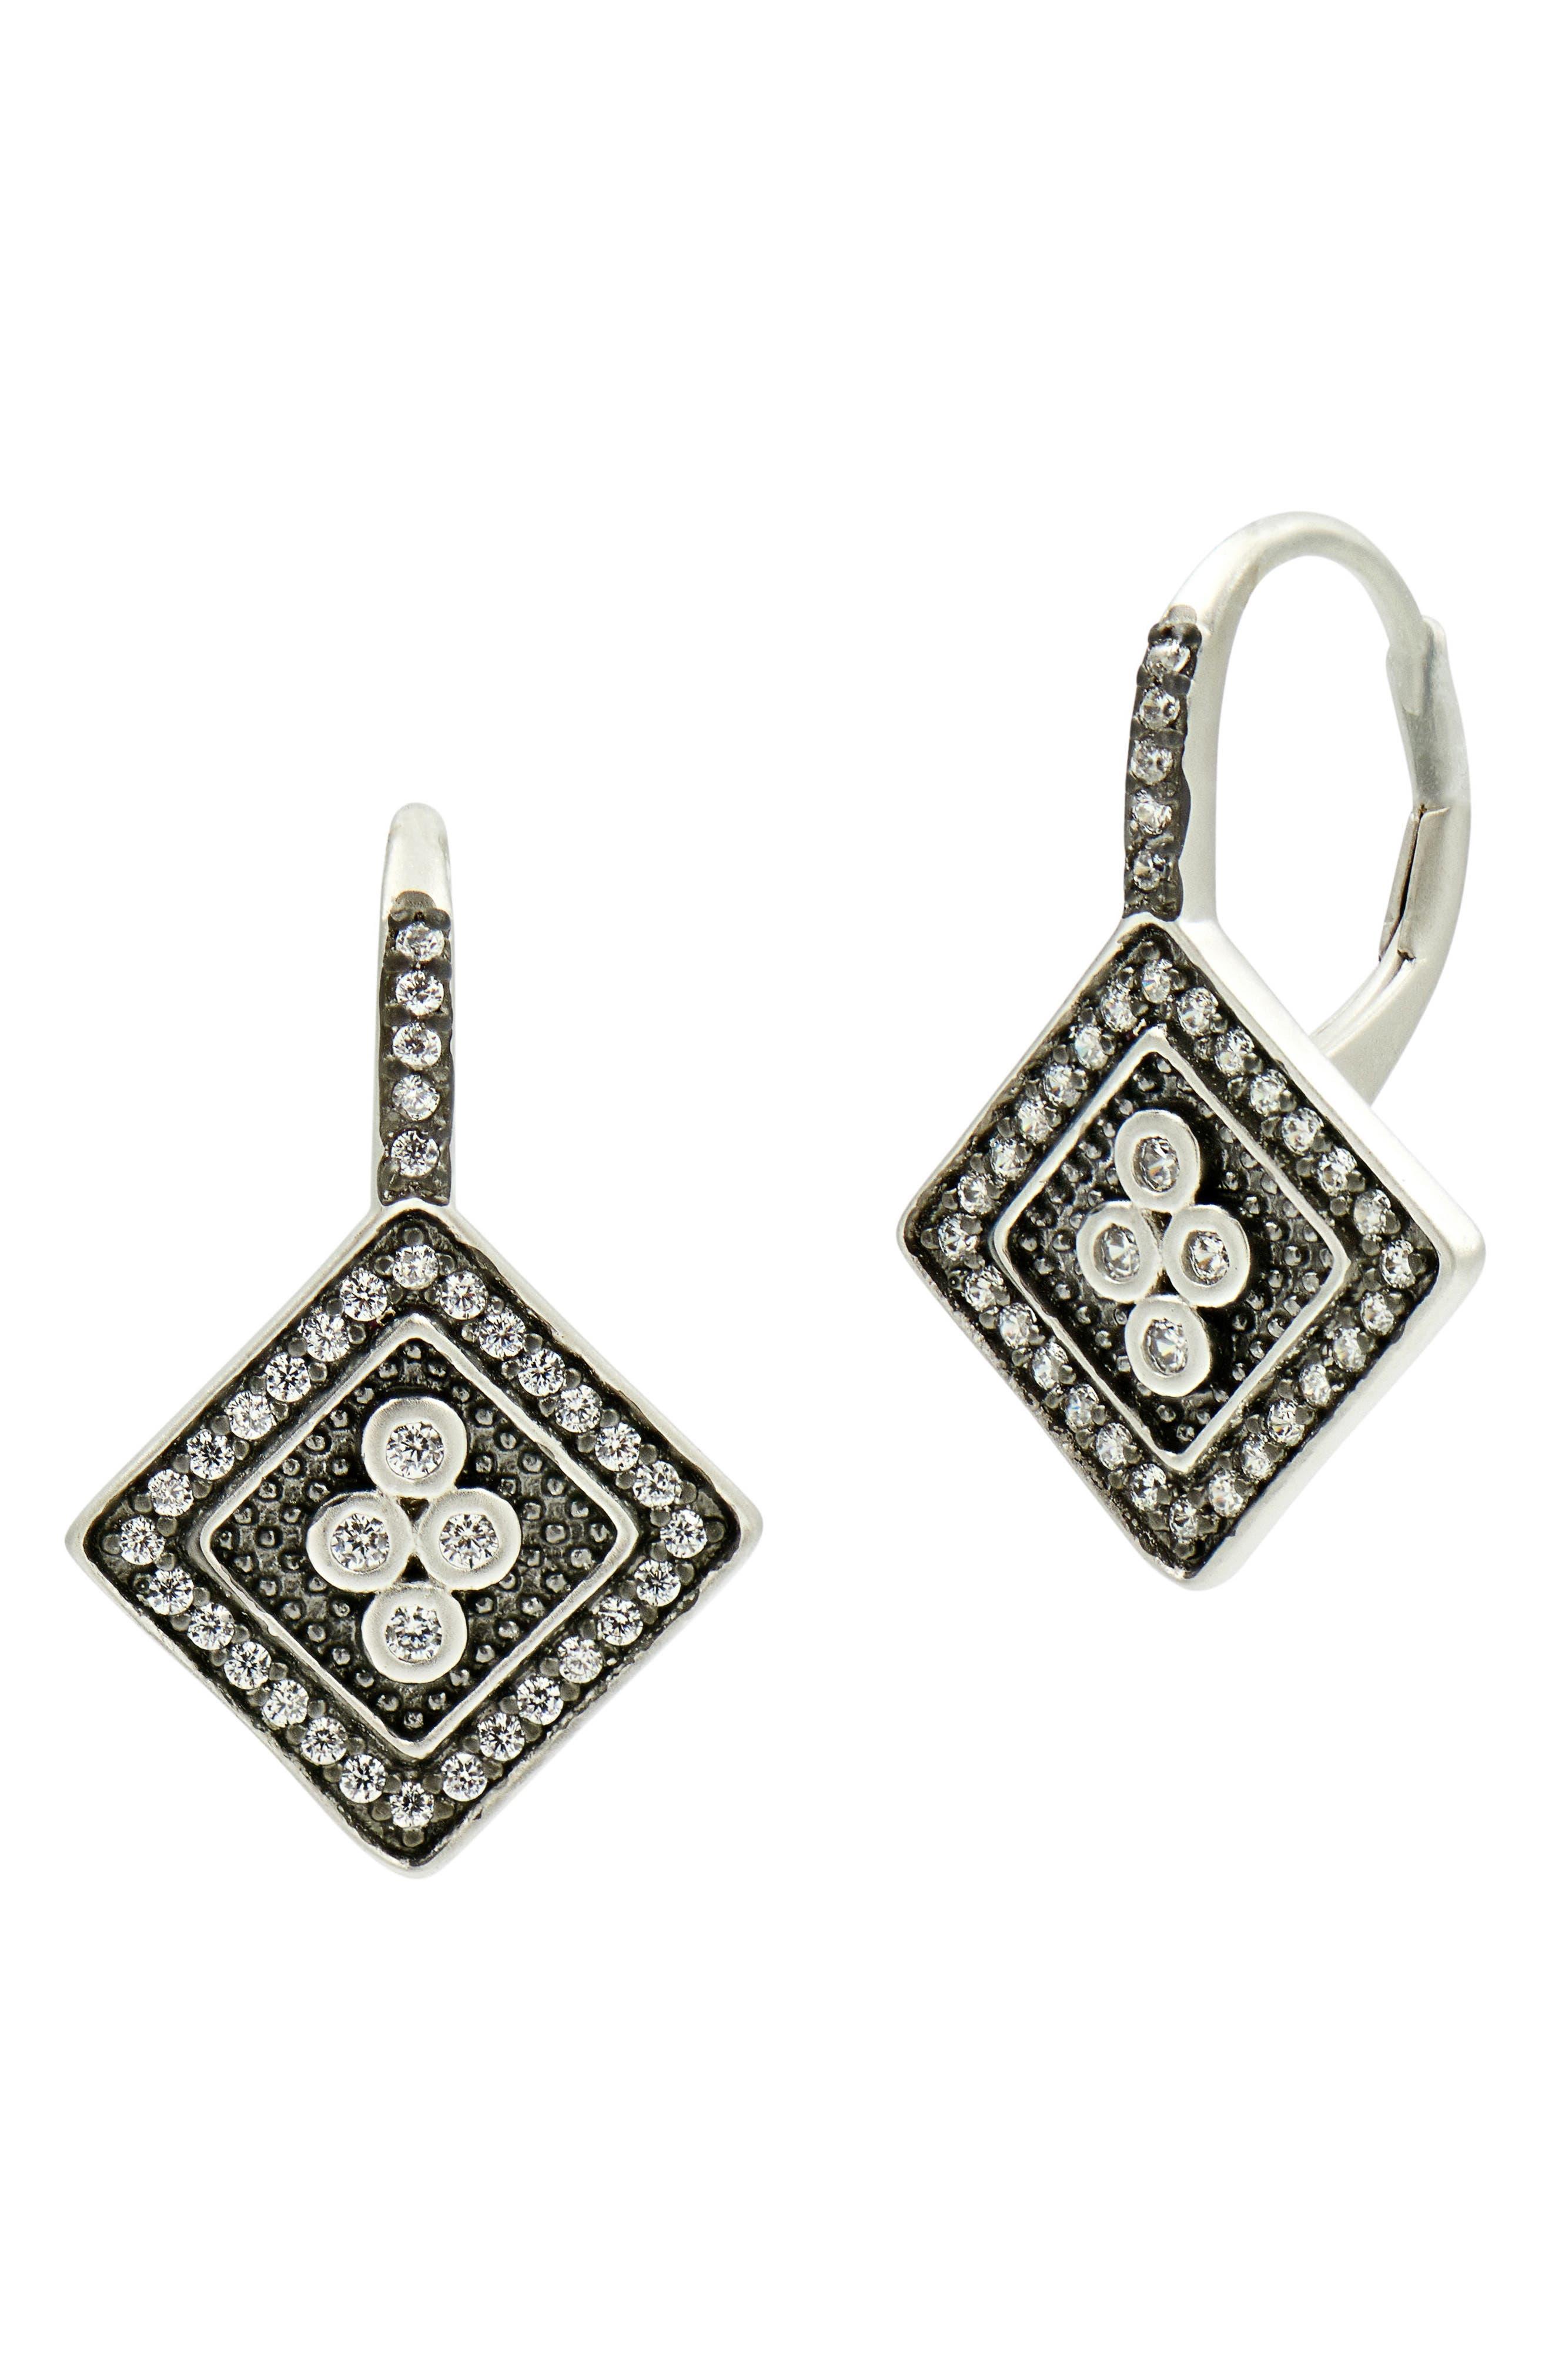 Industrial Finish Cubic Zirconia Drop Earrings,                             Main thumbnail 1, color,                             Black/ Silver